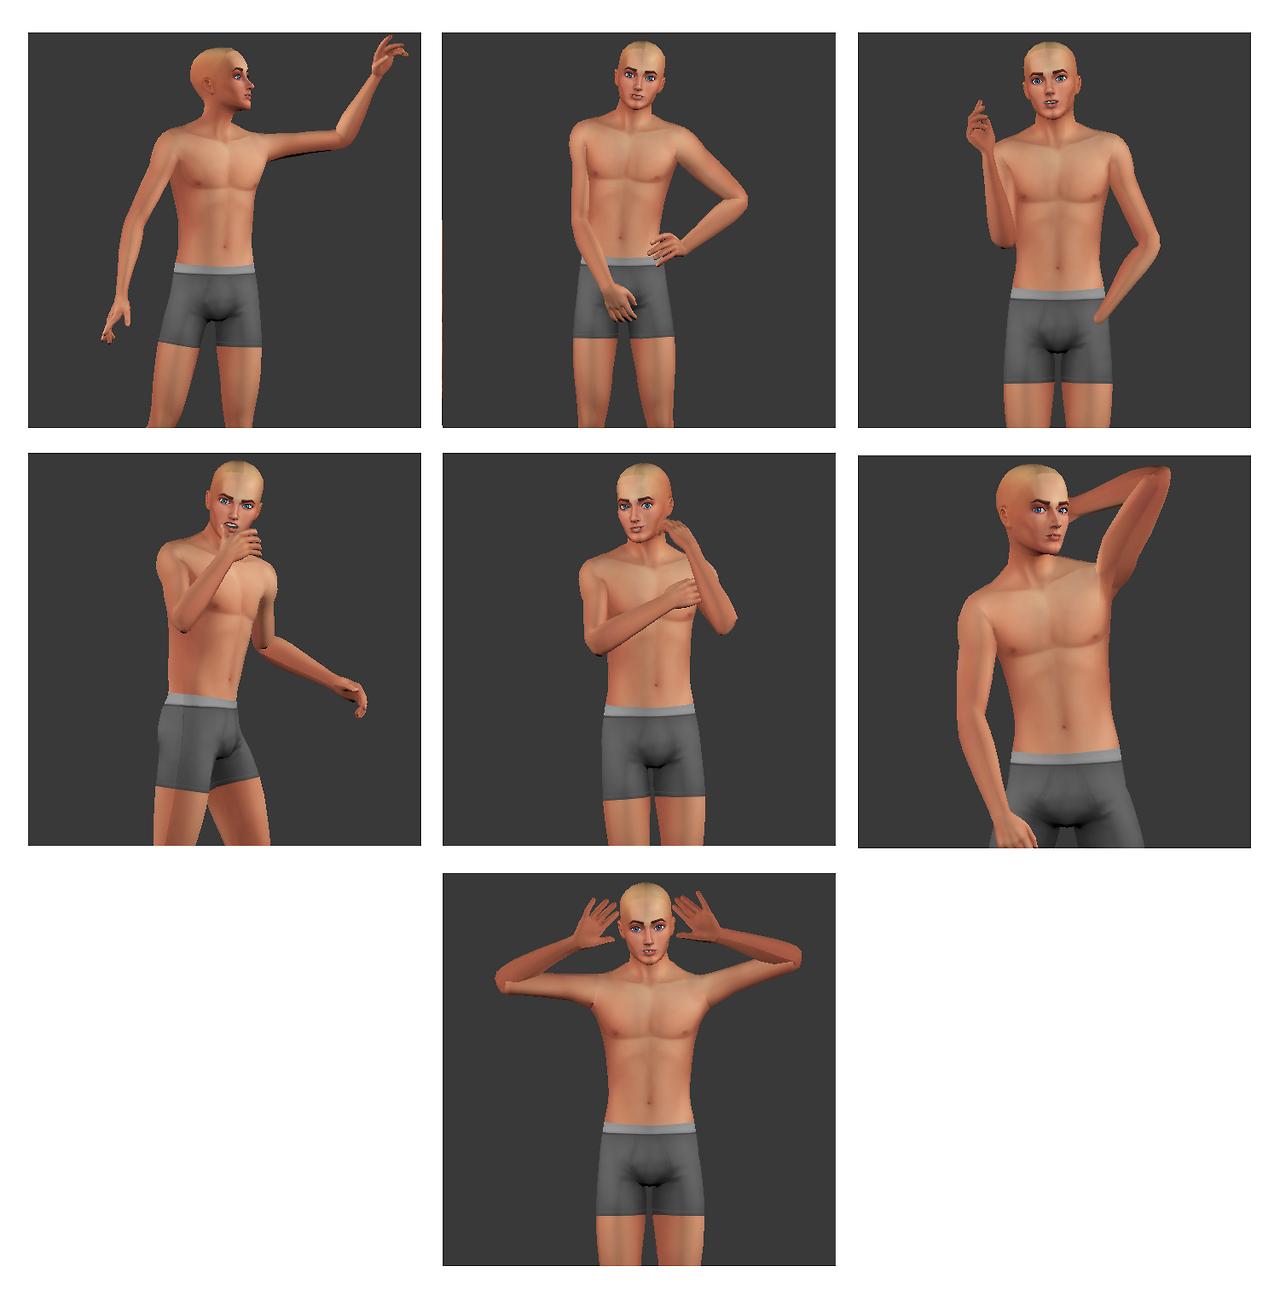 coupurelectrique: MEGA POSE PACK | The Sims 4 Custom Content